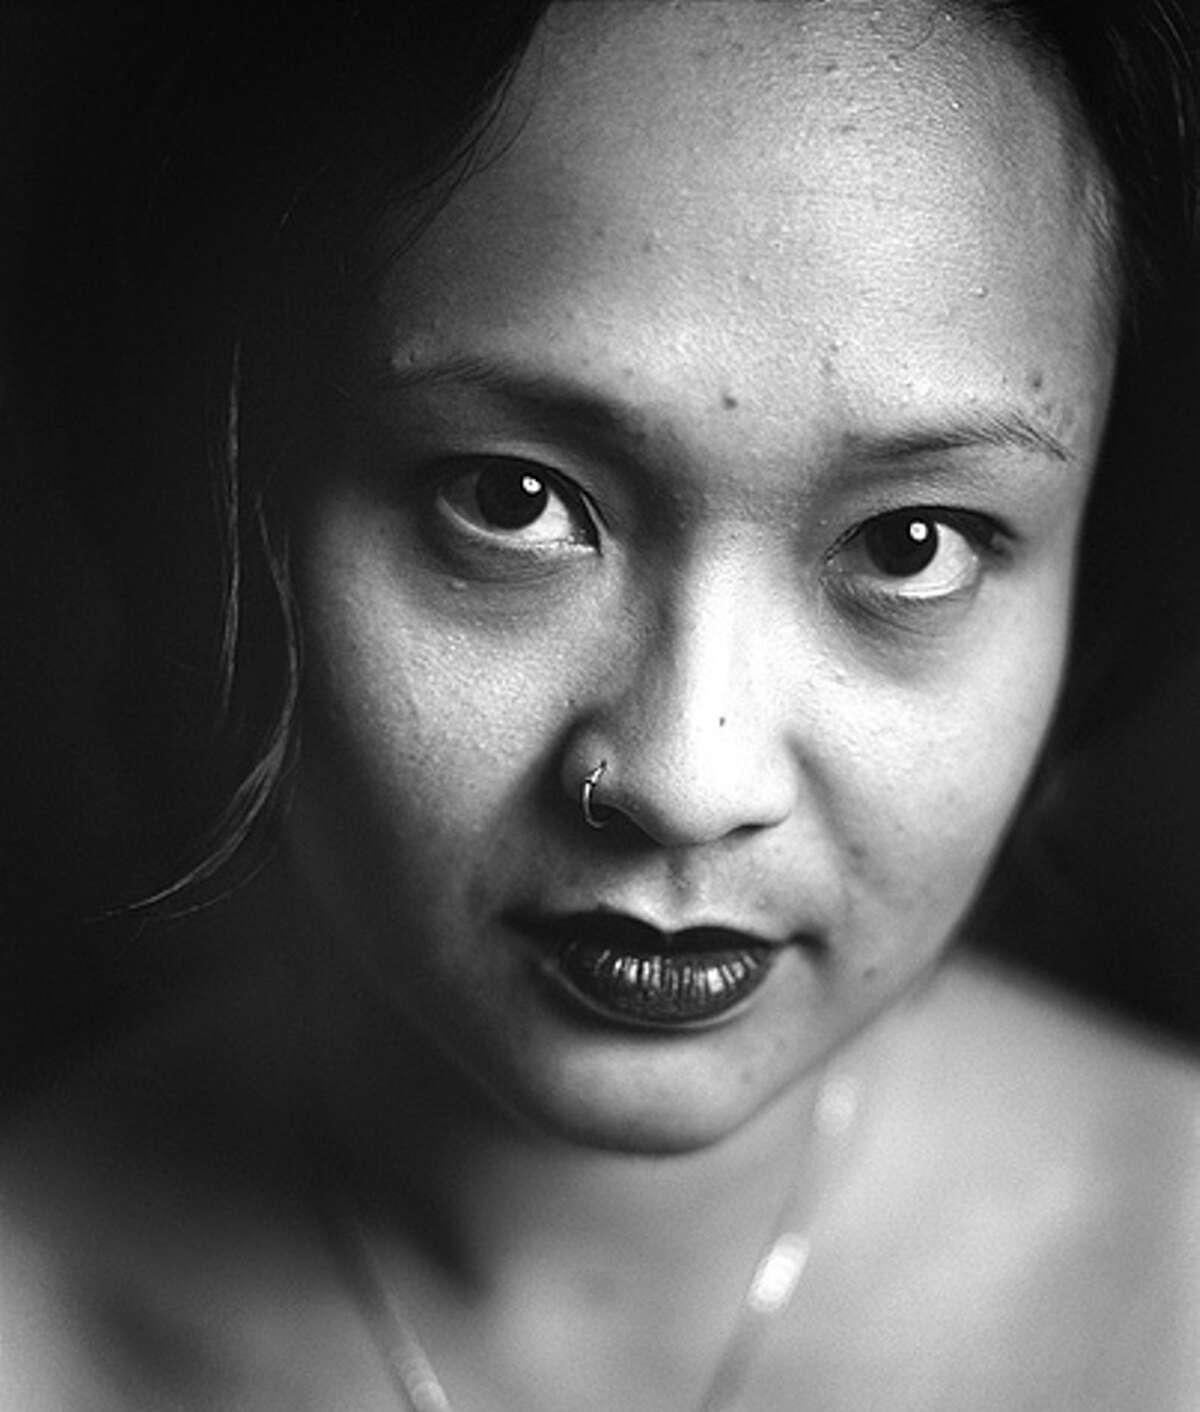 Barbara Jane Reyes' Kuwentuhan brings poets together in a largely improvised format.